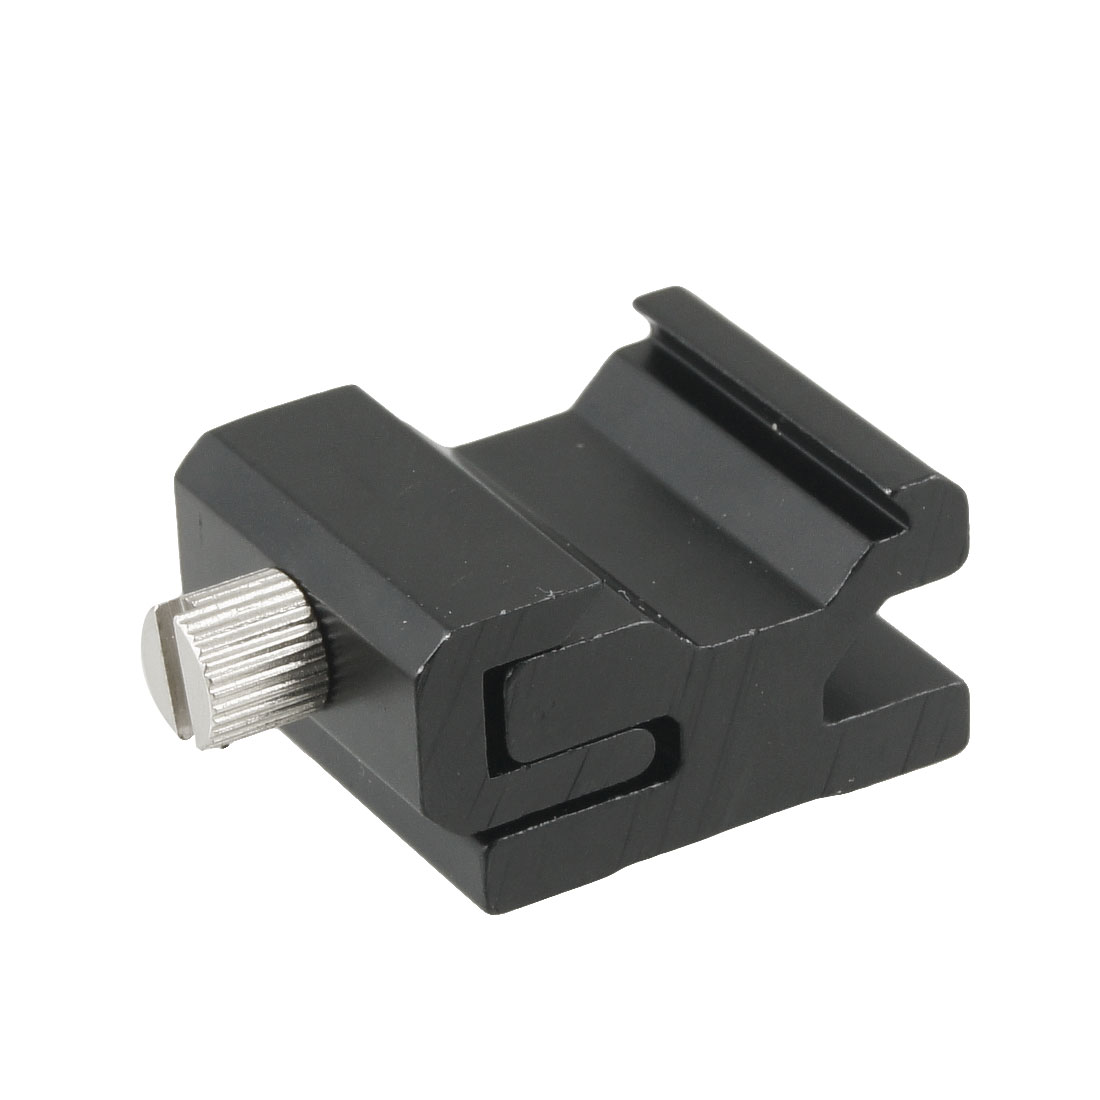 "Photo Flash Adapter Hot Shoe Mount With 1/4"" Bracket Thread Bracket"